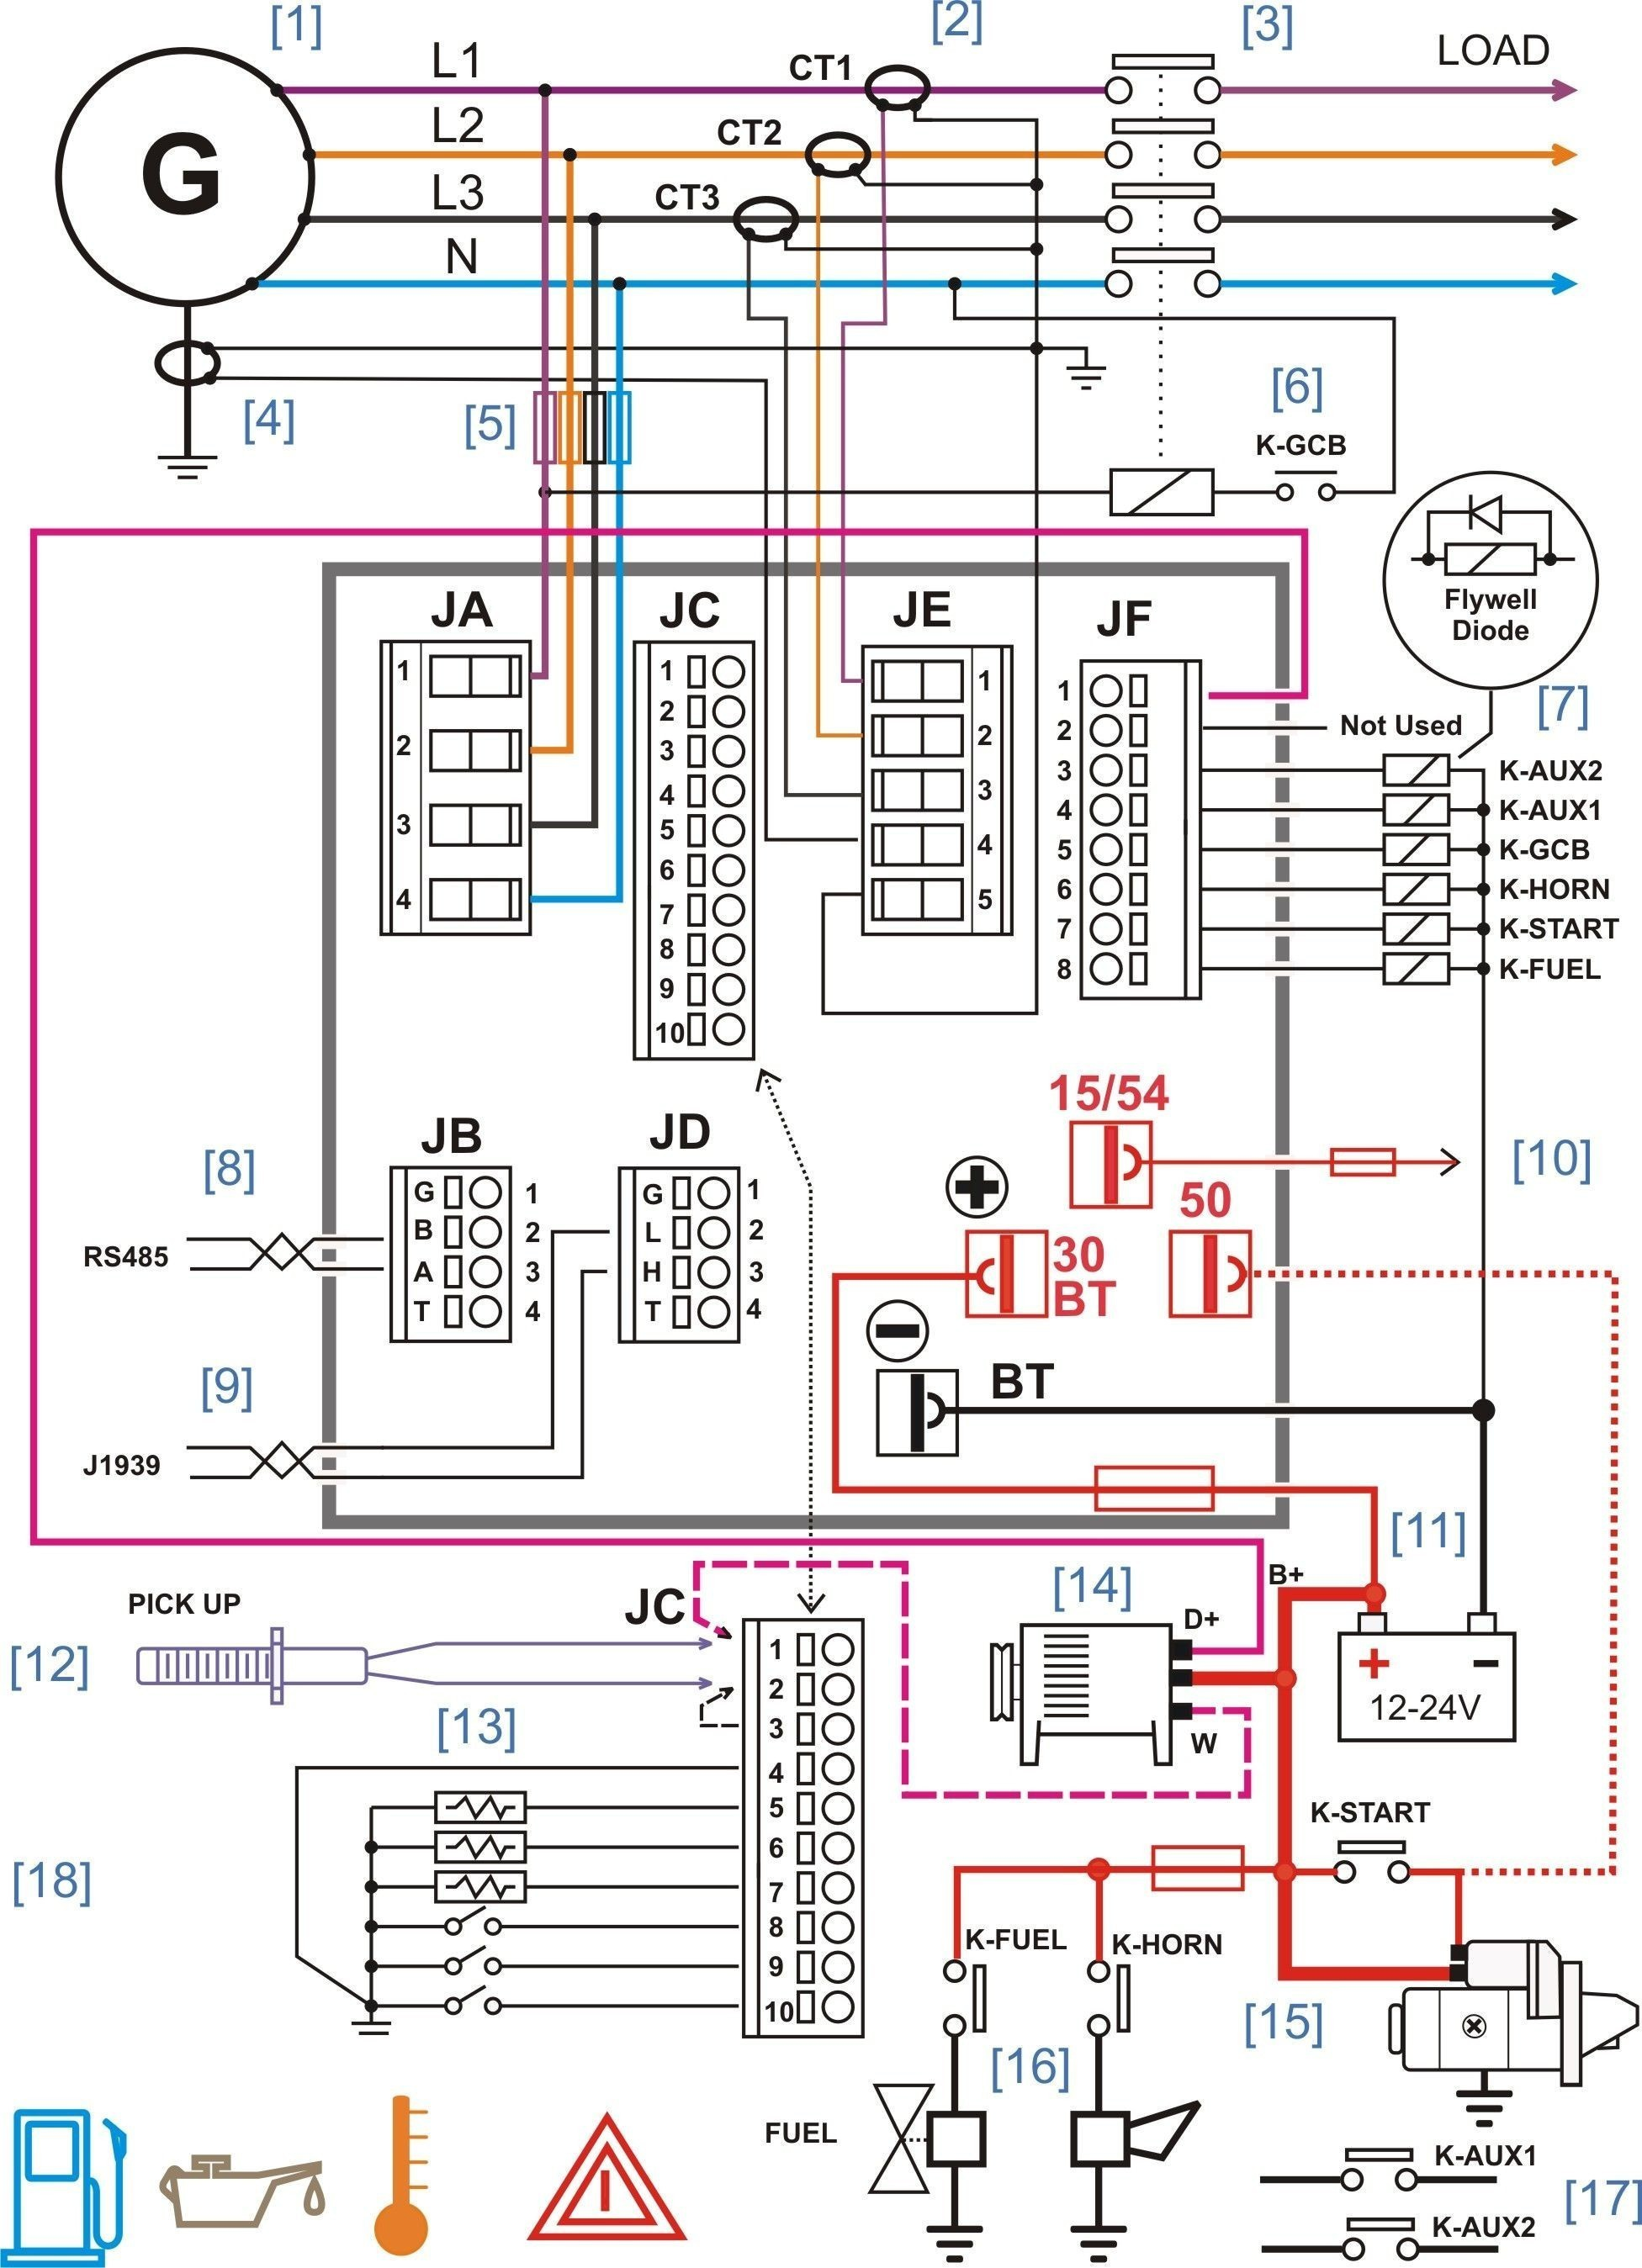 Generator Changeover Switch Wiring Diagram Wiring Diagram Generator Changeover Switch New Portable Generator Of Generator Changeover Switch Wiring Diagram